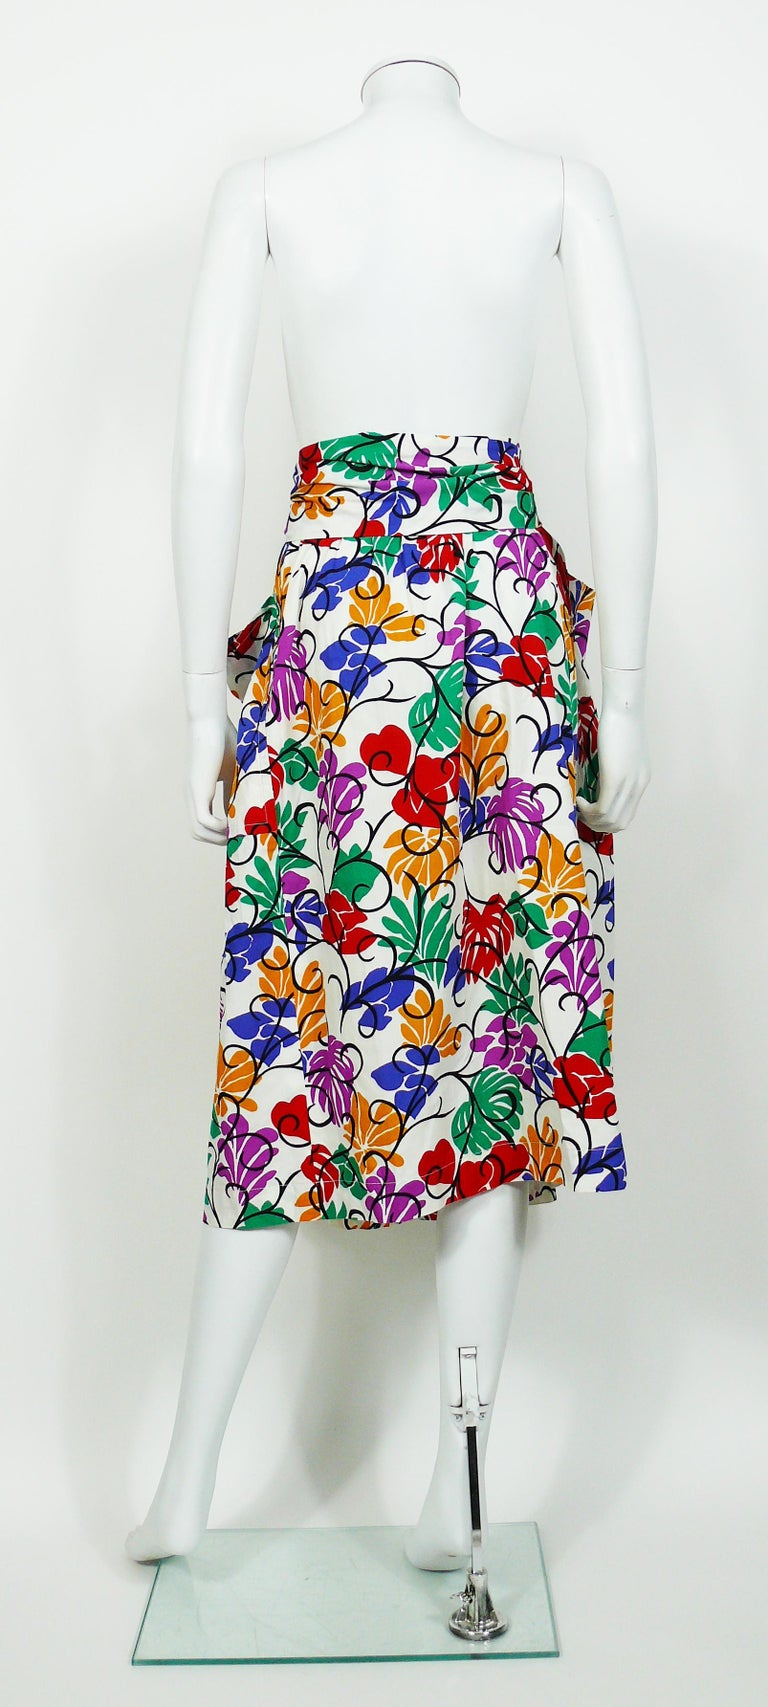 Yves Saint Laurent YSL Vintage Matisse Inspired Floral Cotton Sash Skirt For Sale 2